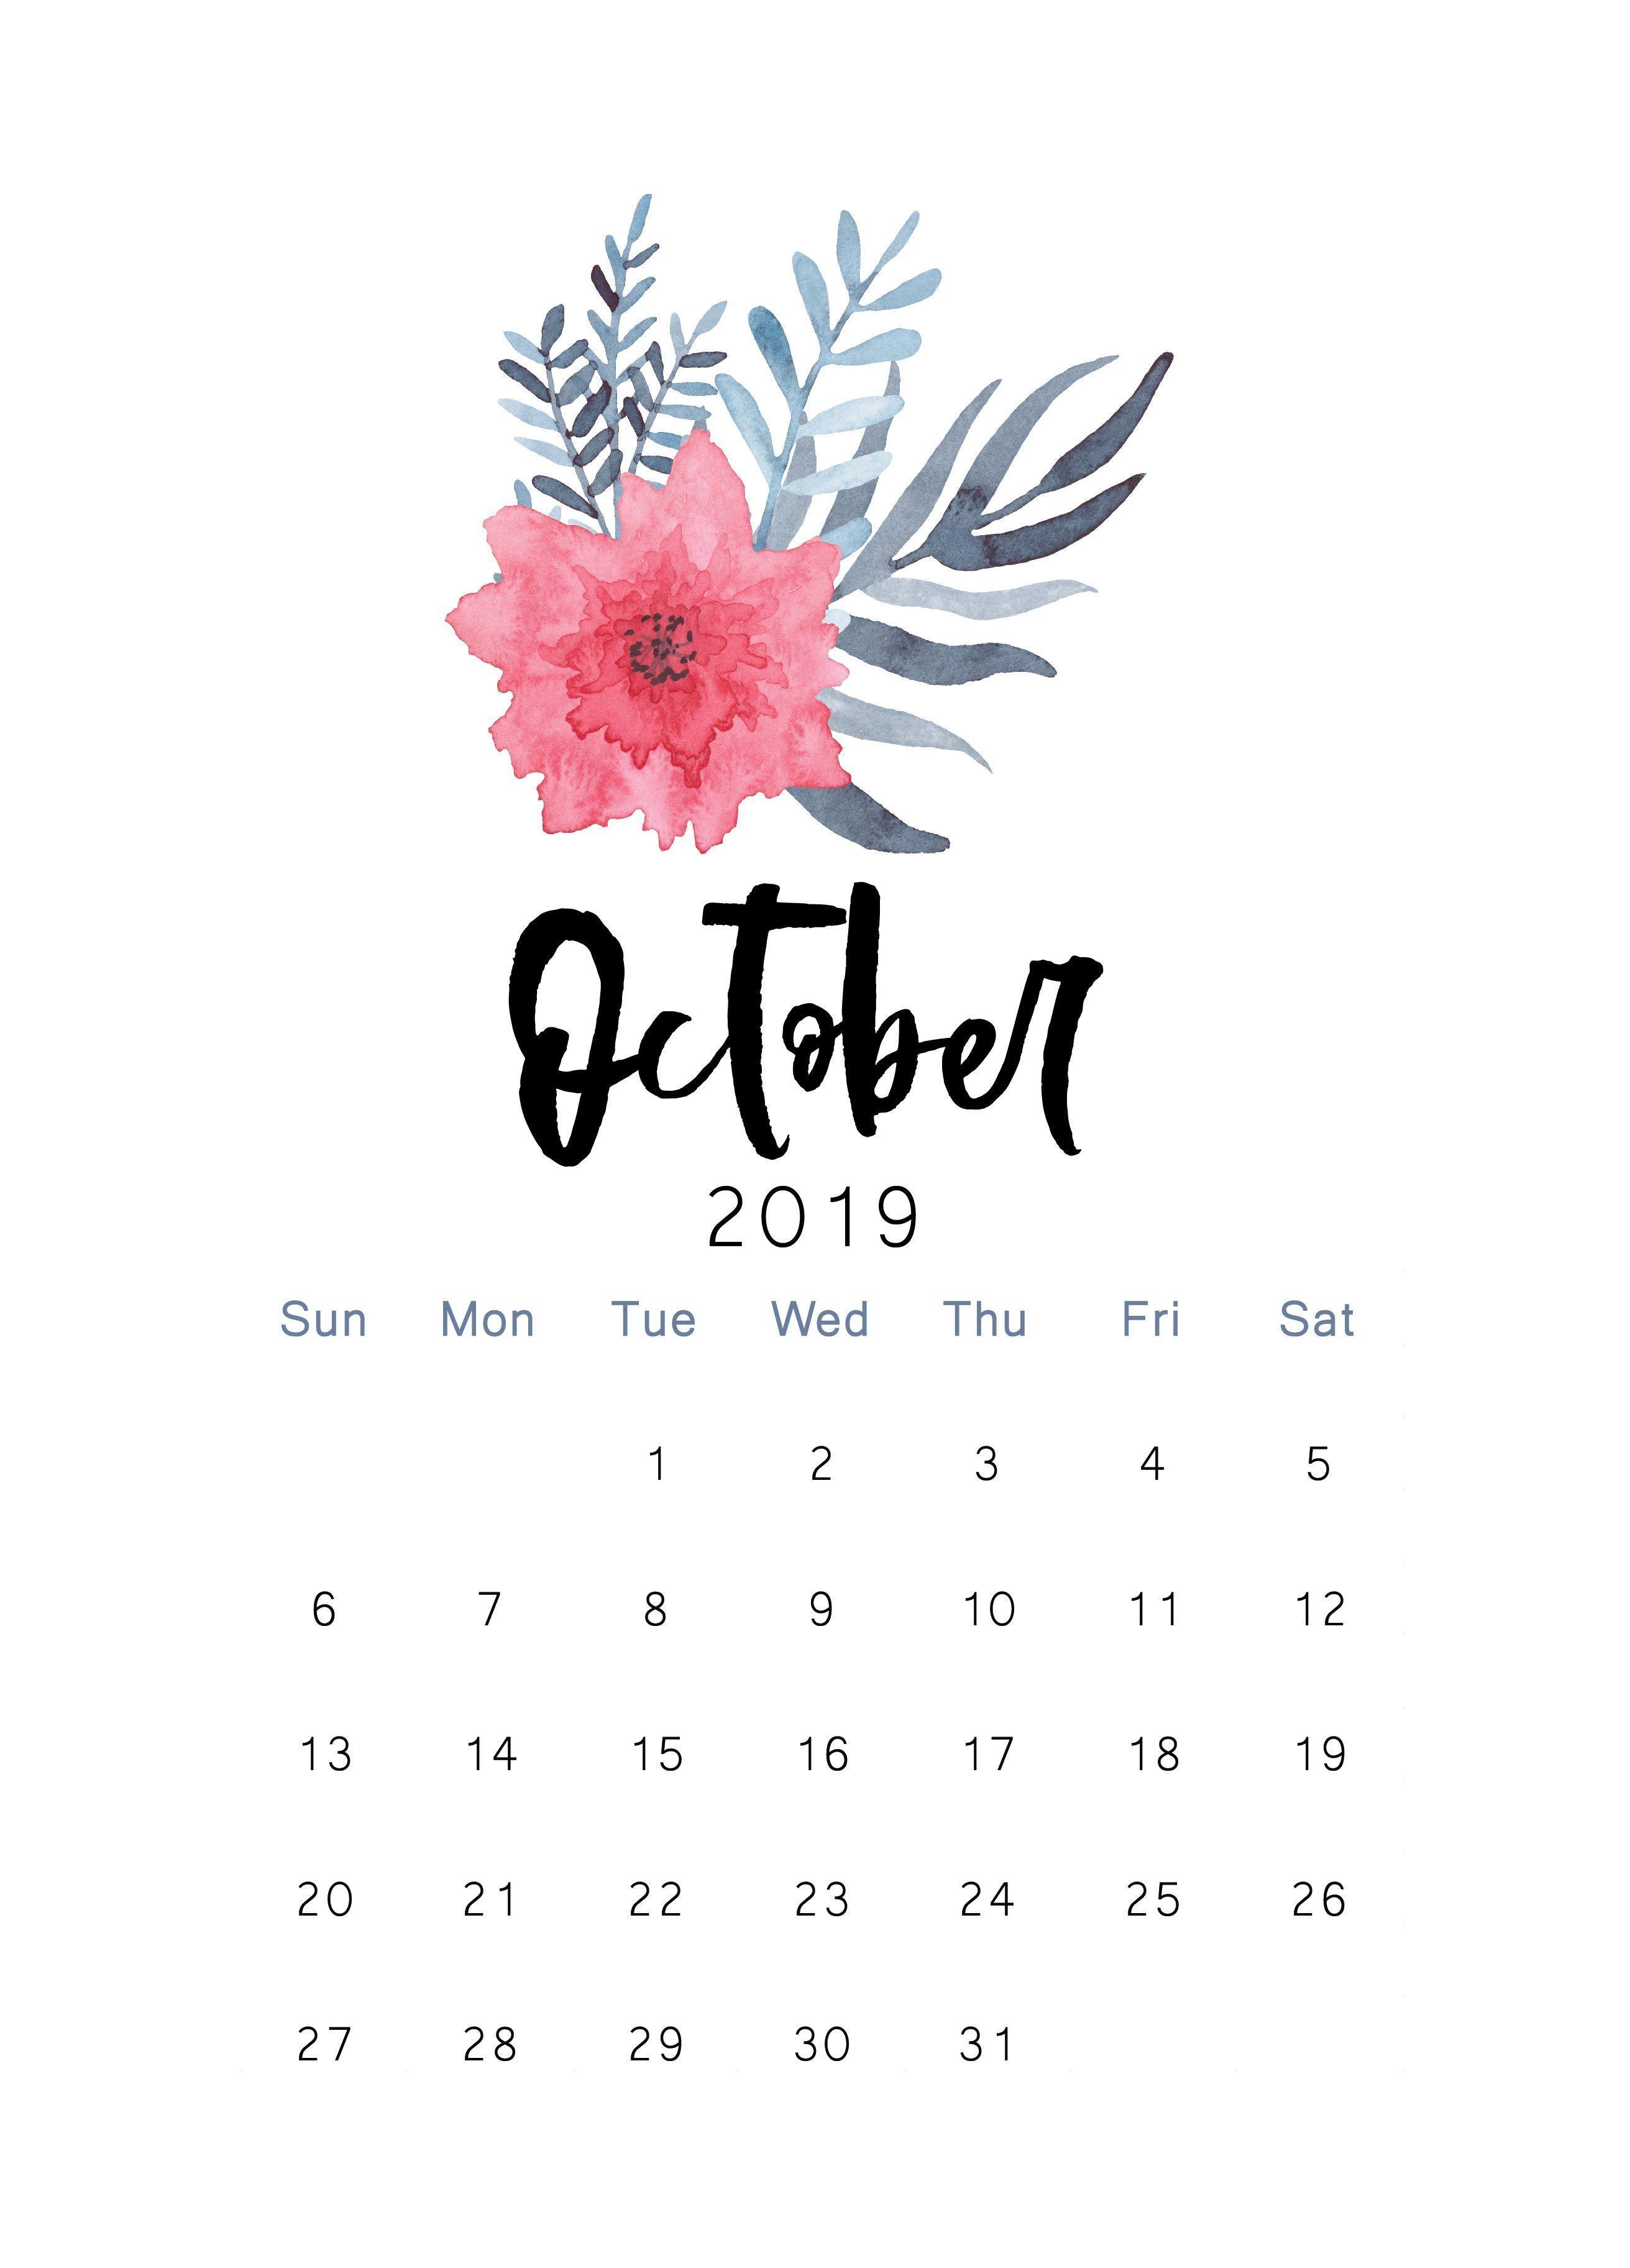 October Calendar Wallpapers